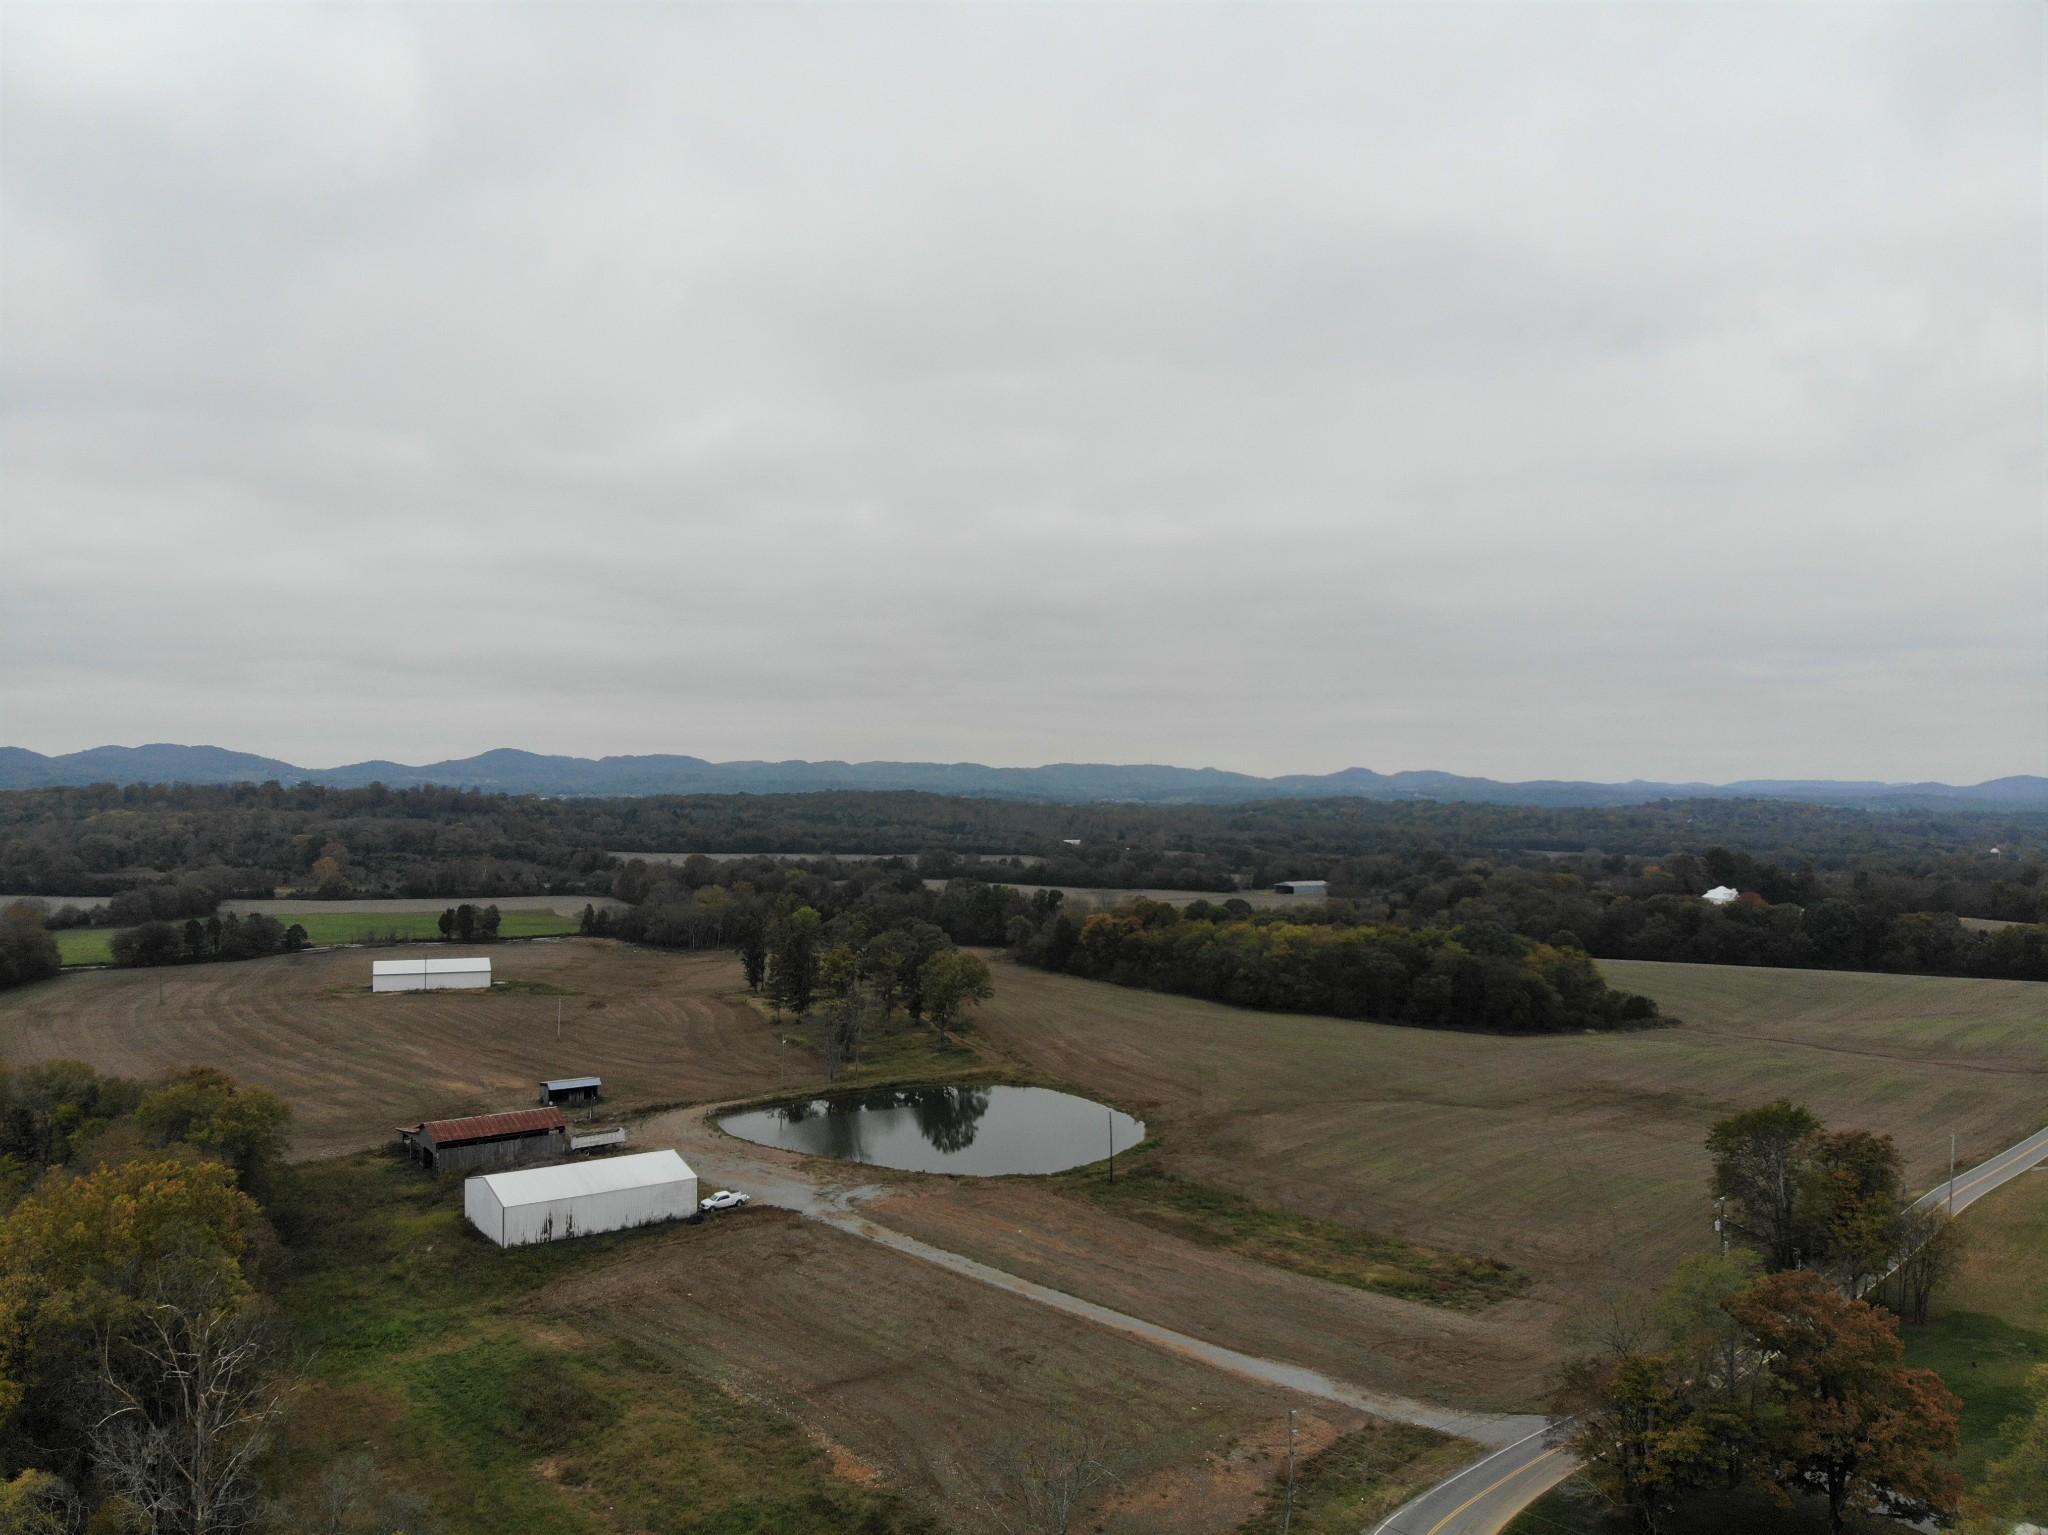 4 McFarlin Rd, Nolensville, TN 37135 - Nolensville, TN real estate listing